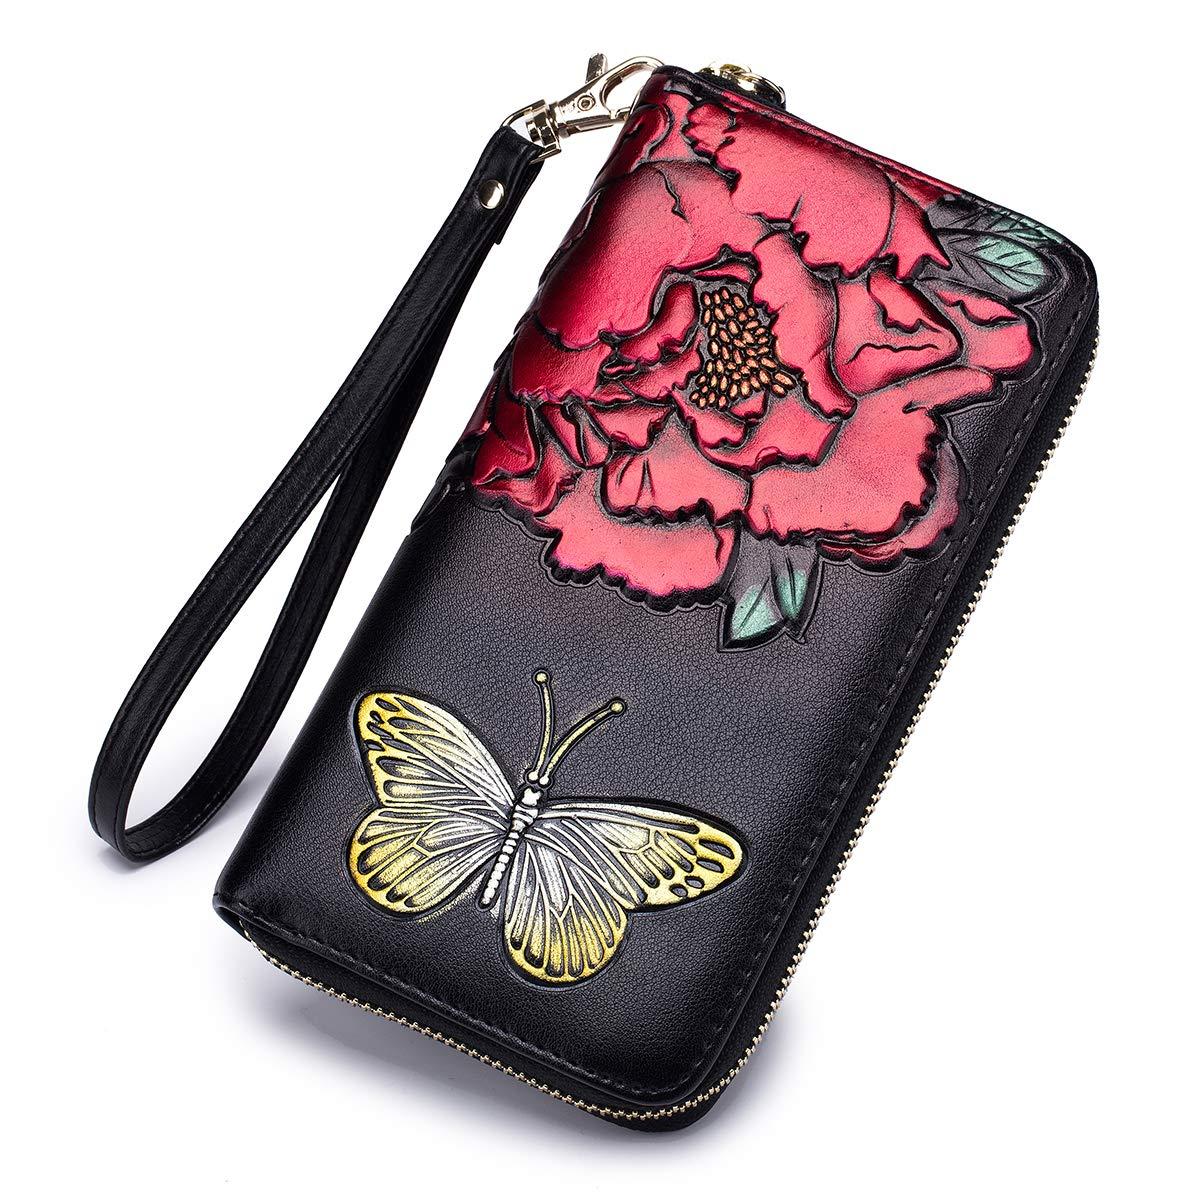 Red imeetu RFID Blocking Credit Card Holder Case Clutch Bag Wallet Women Leather Large Wristlet Purses with Zipper Pocket